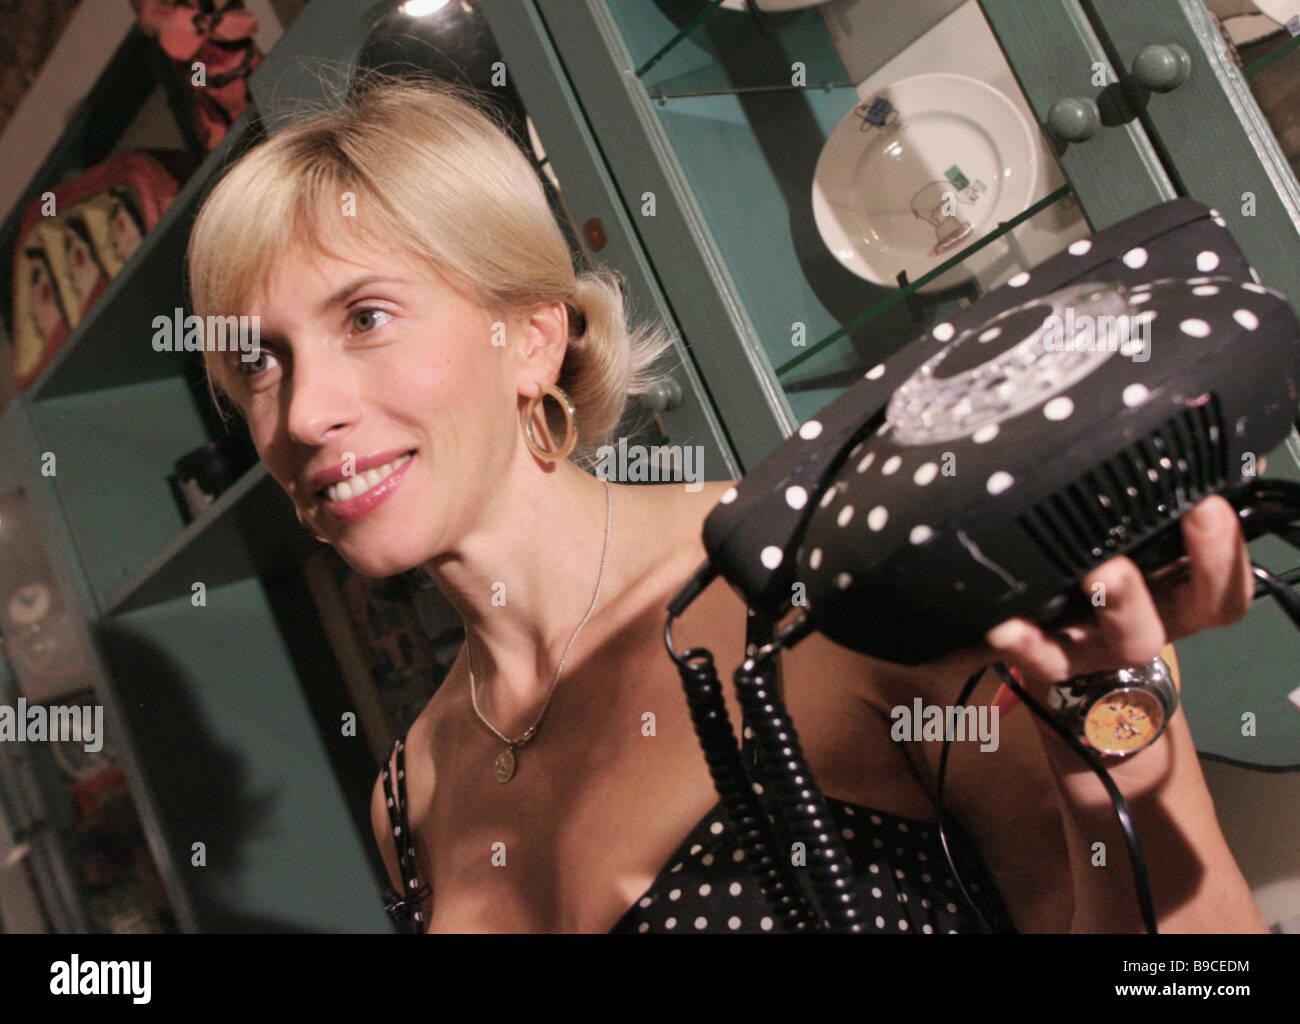 Singer Alena Sviridova at a high society party in Moscow - Stock Image